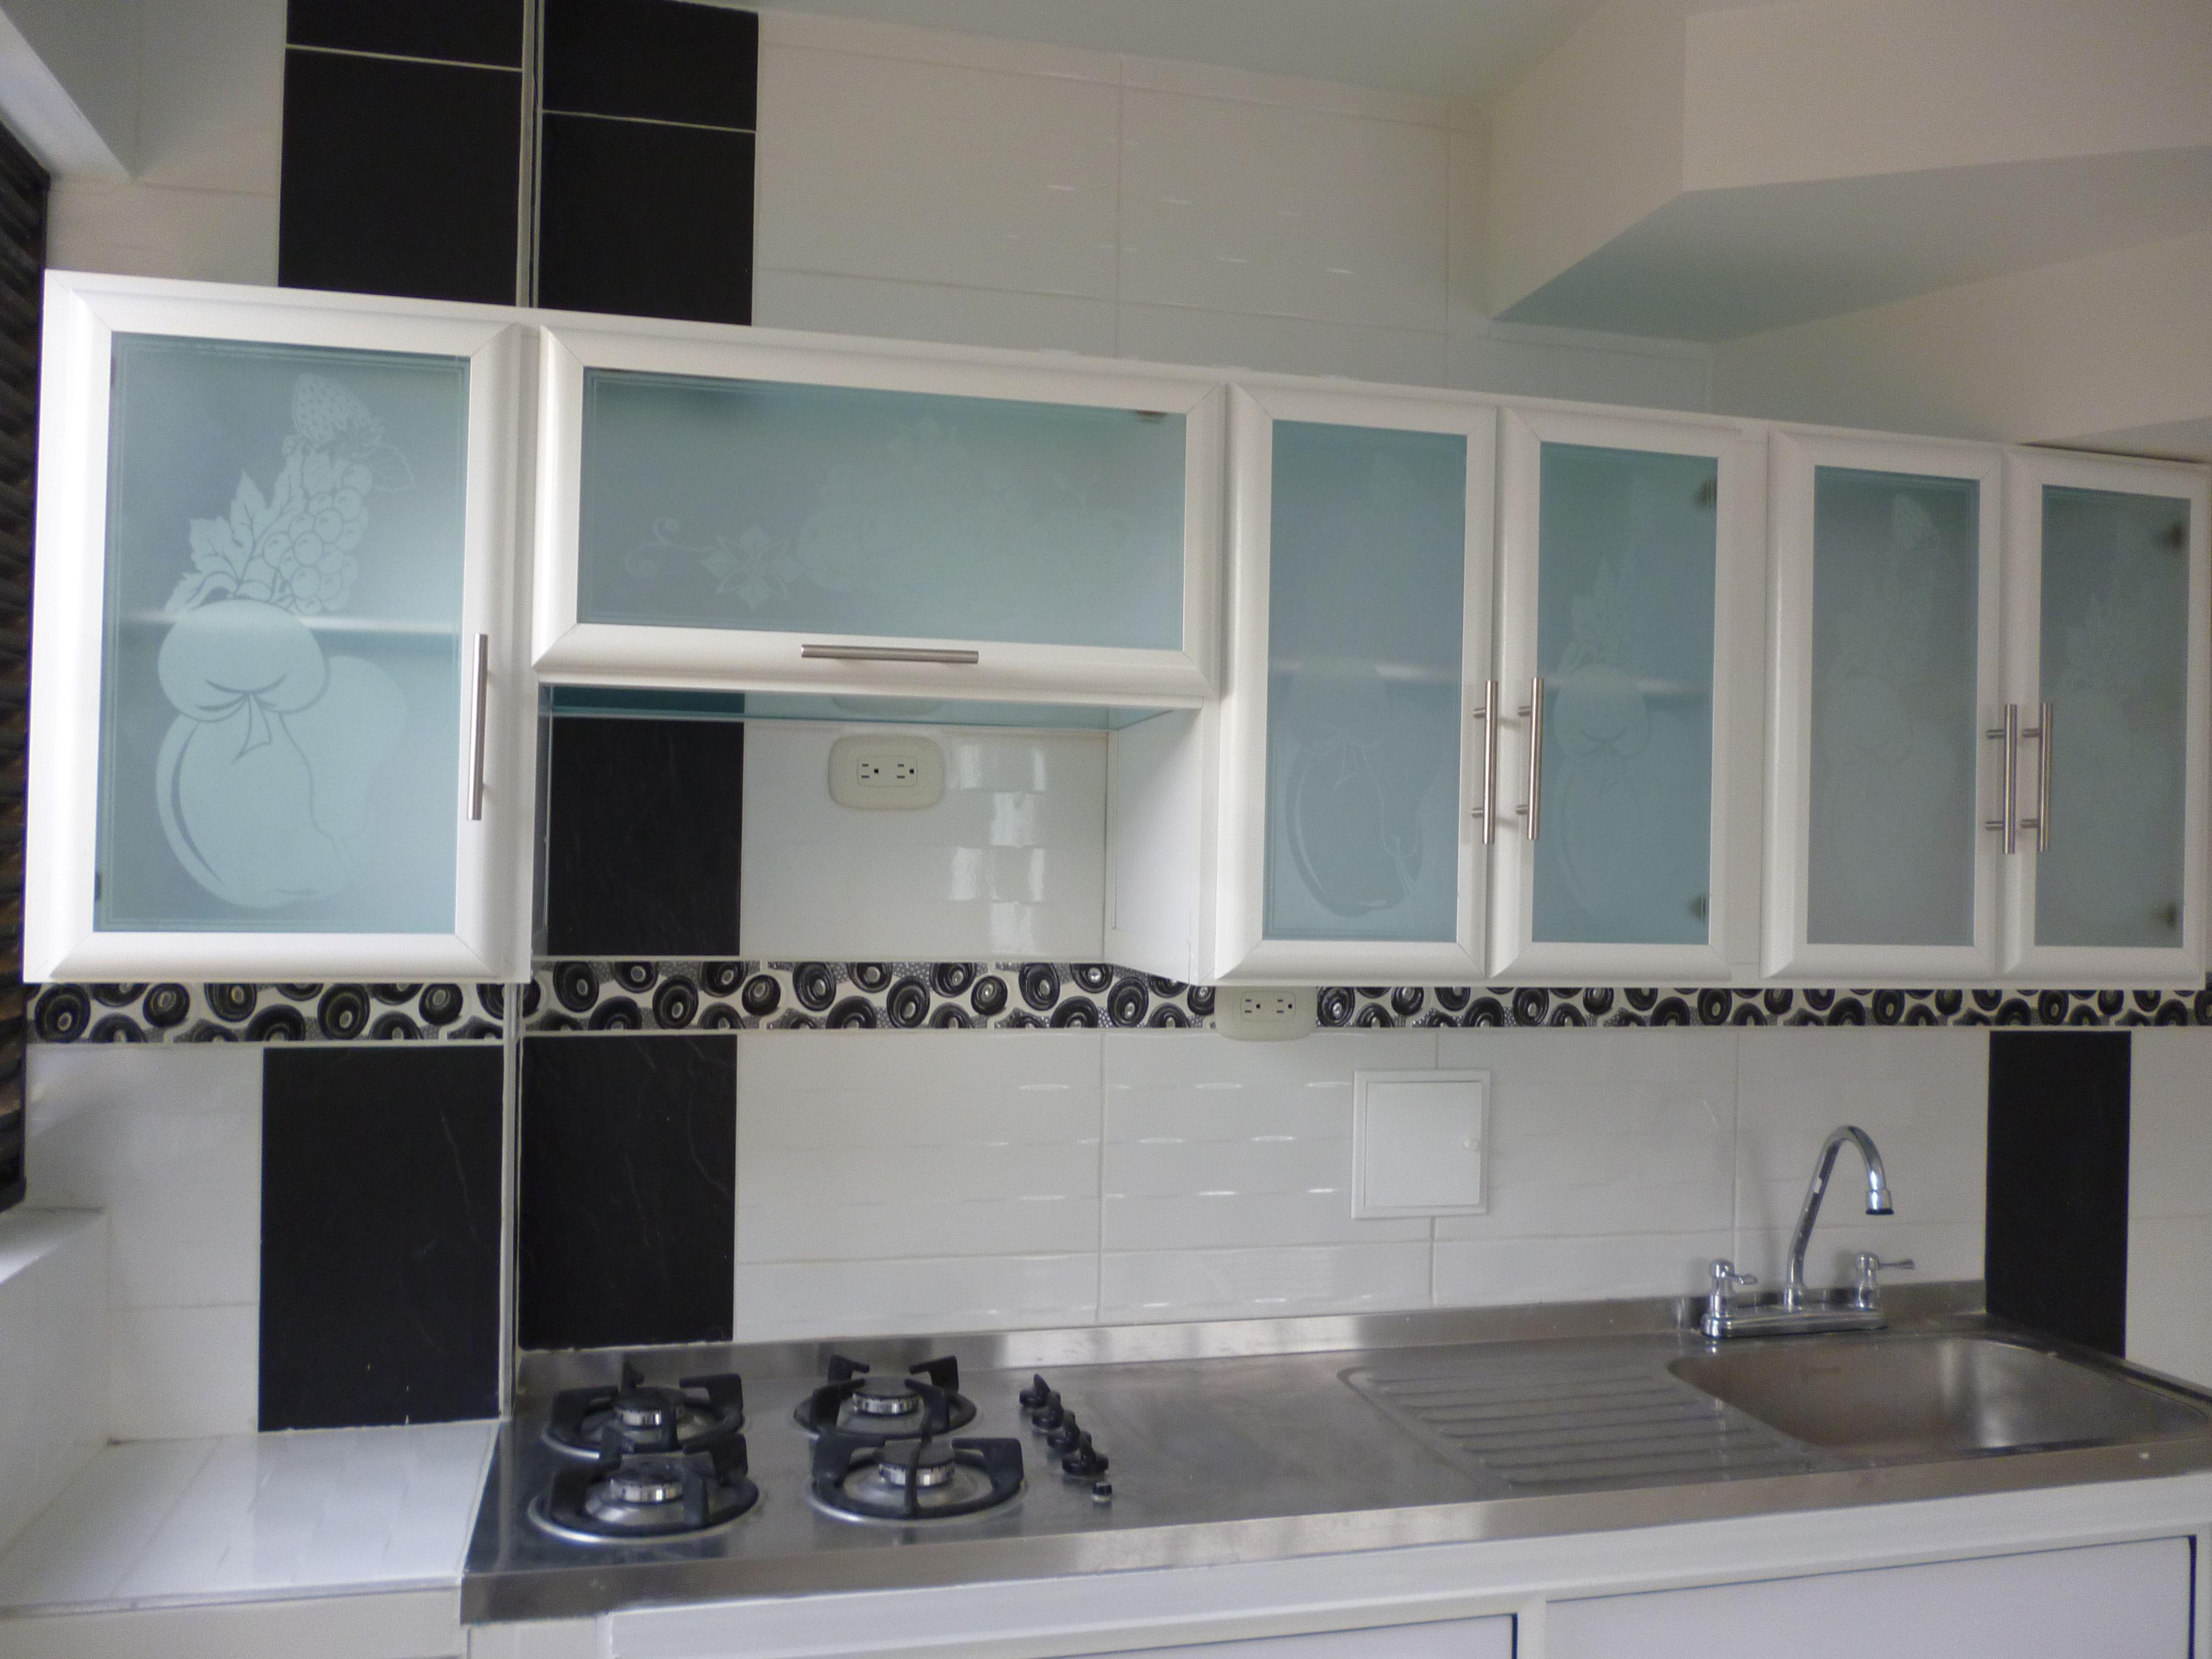 Puerta de aluminio para cocina cocina en 2019 cocinas for Ventanas de aluminio para cocina